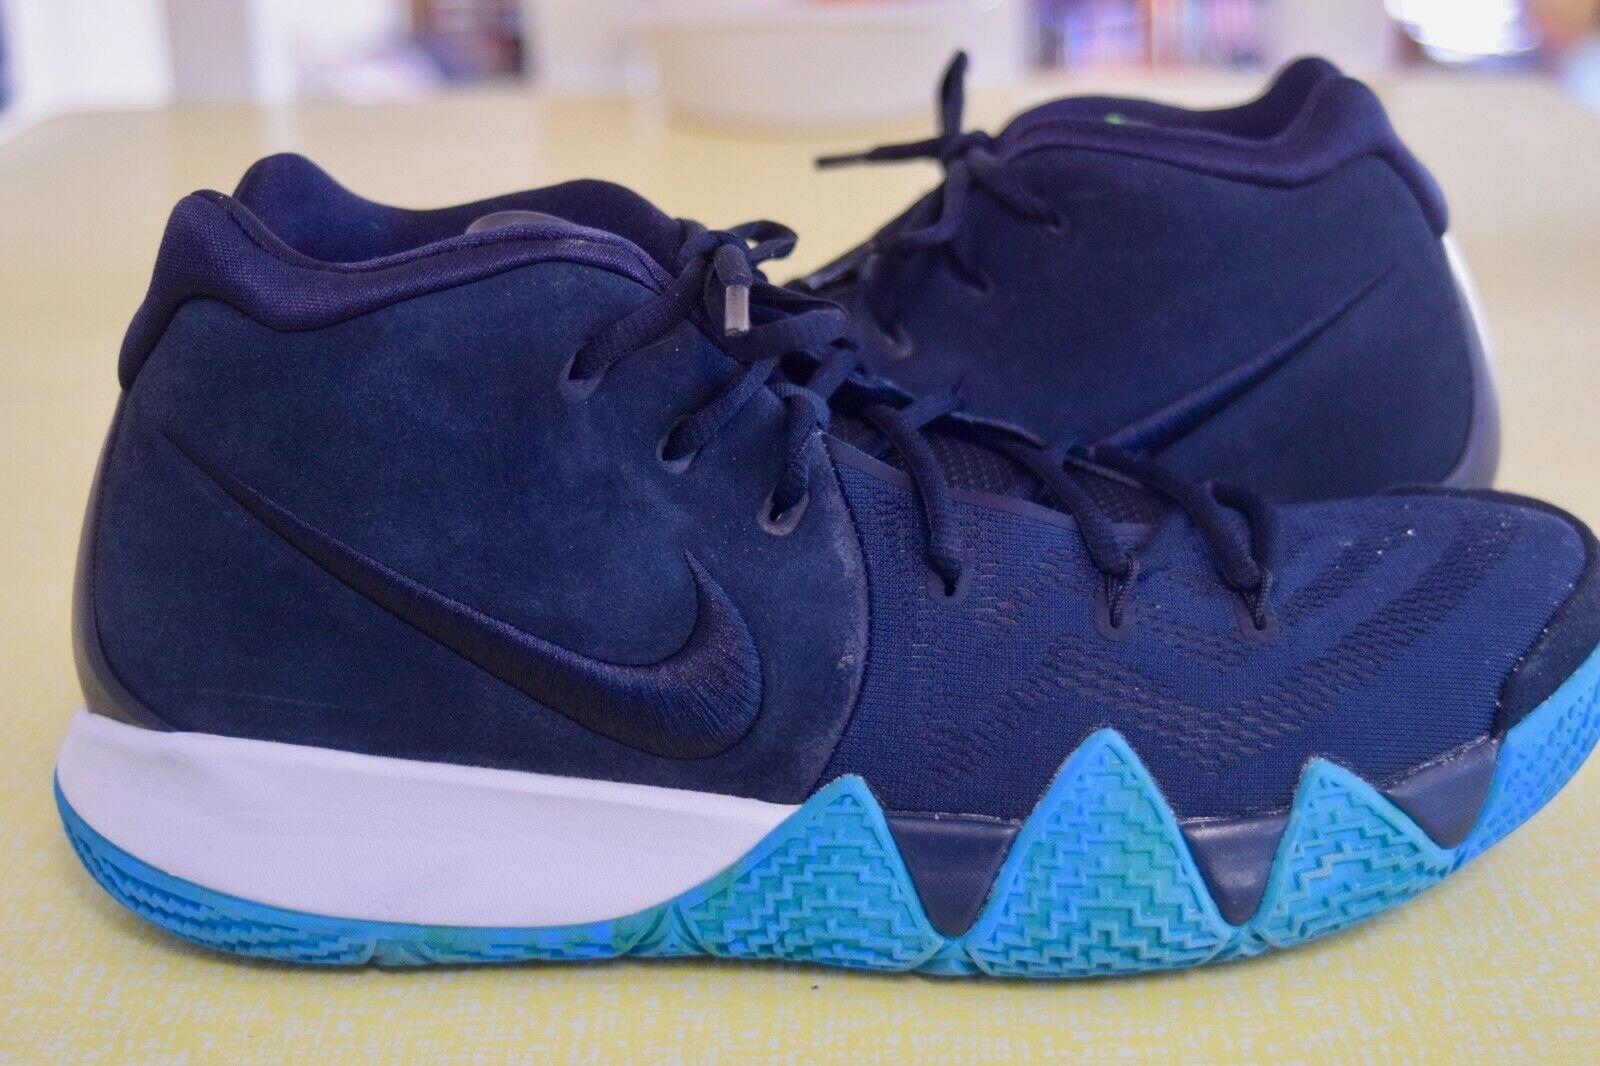 SIZE 13 USED Nike Kyrie 4 IV  shoes Obsidian bluee 943806-401